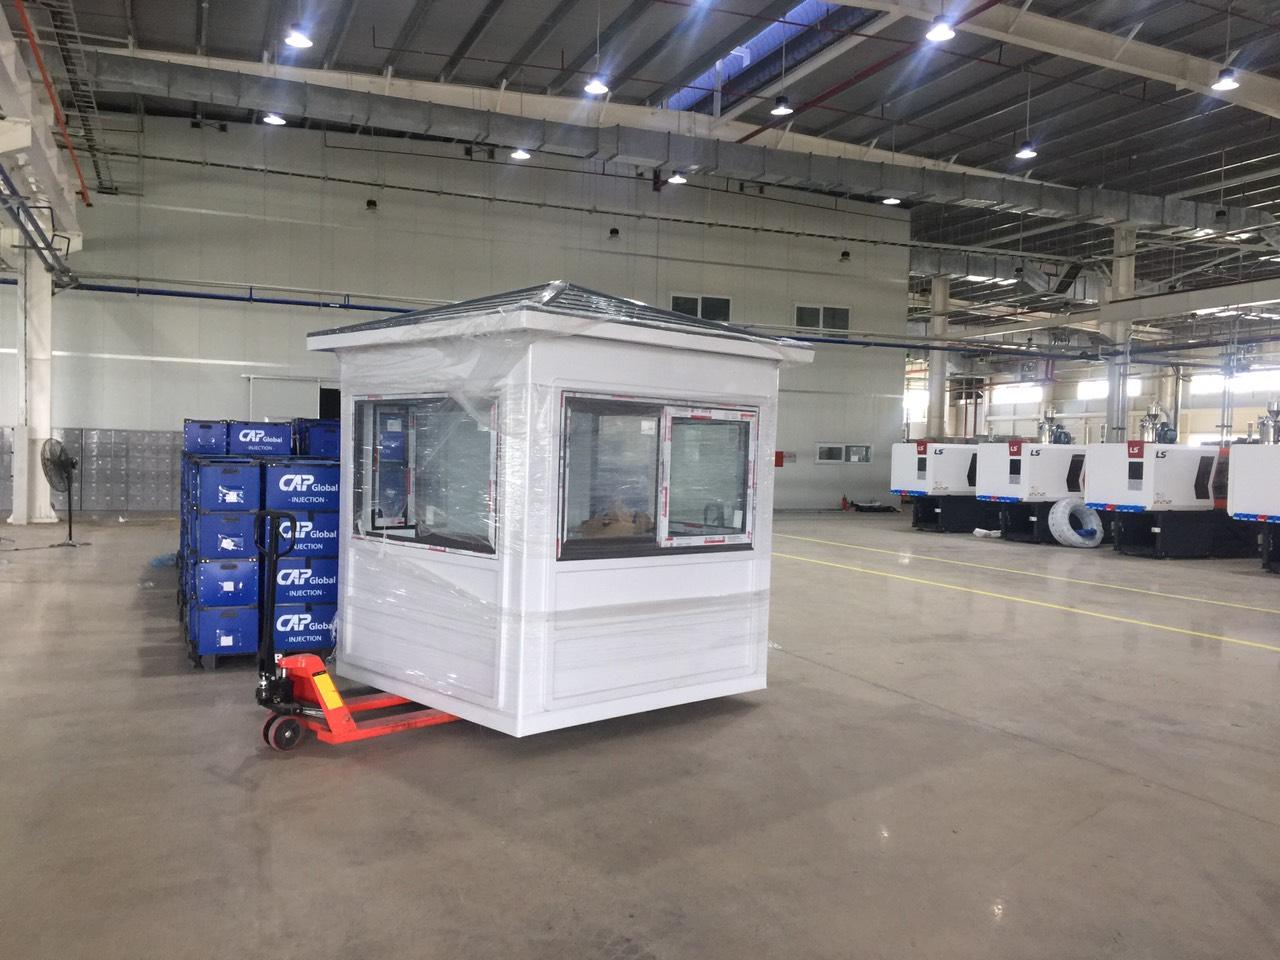 Cabin bảo vệ Handy Booths